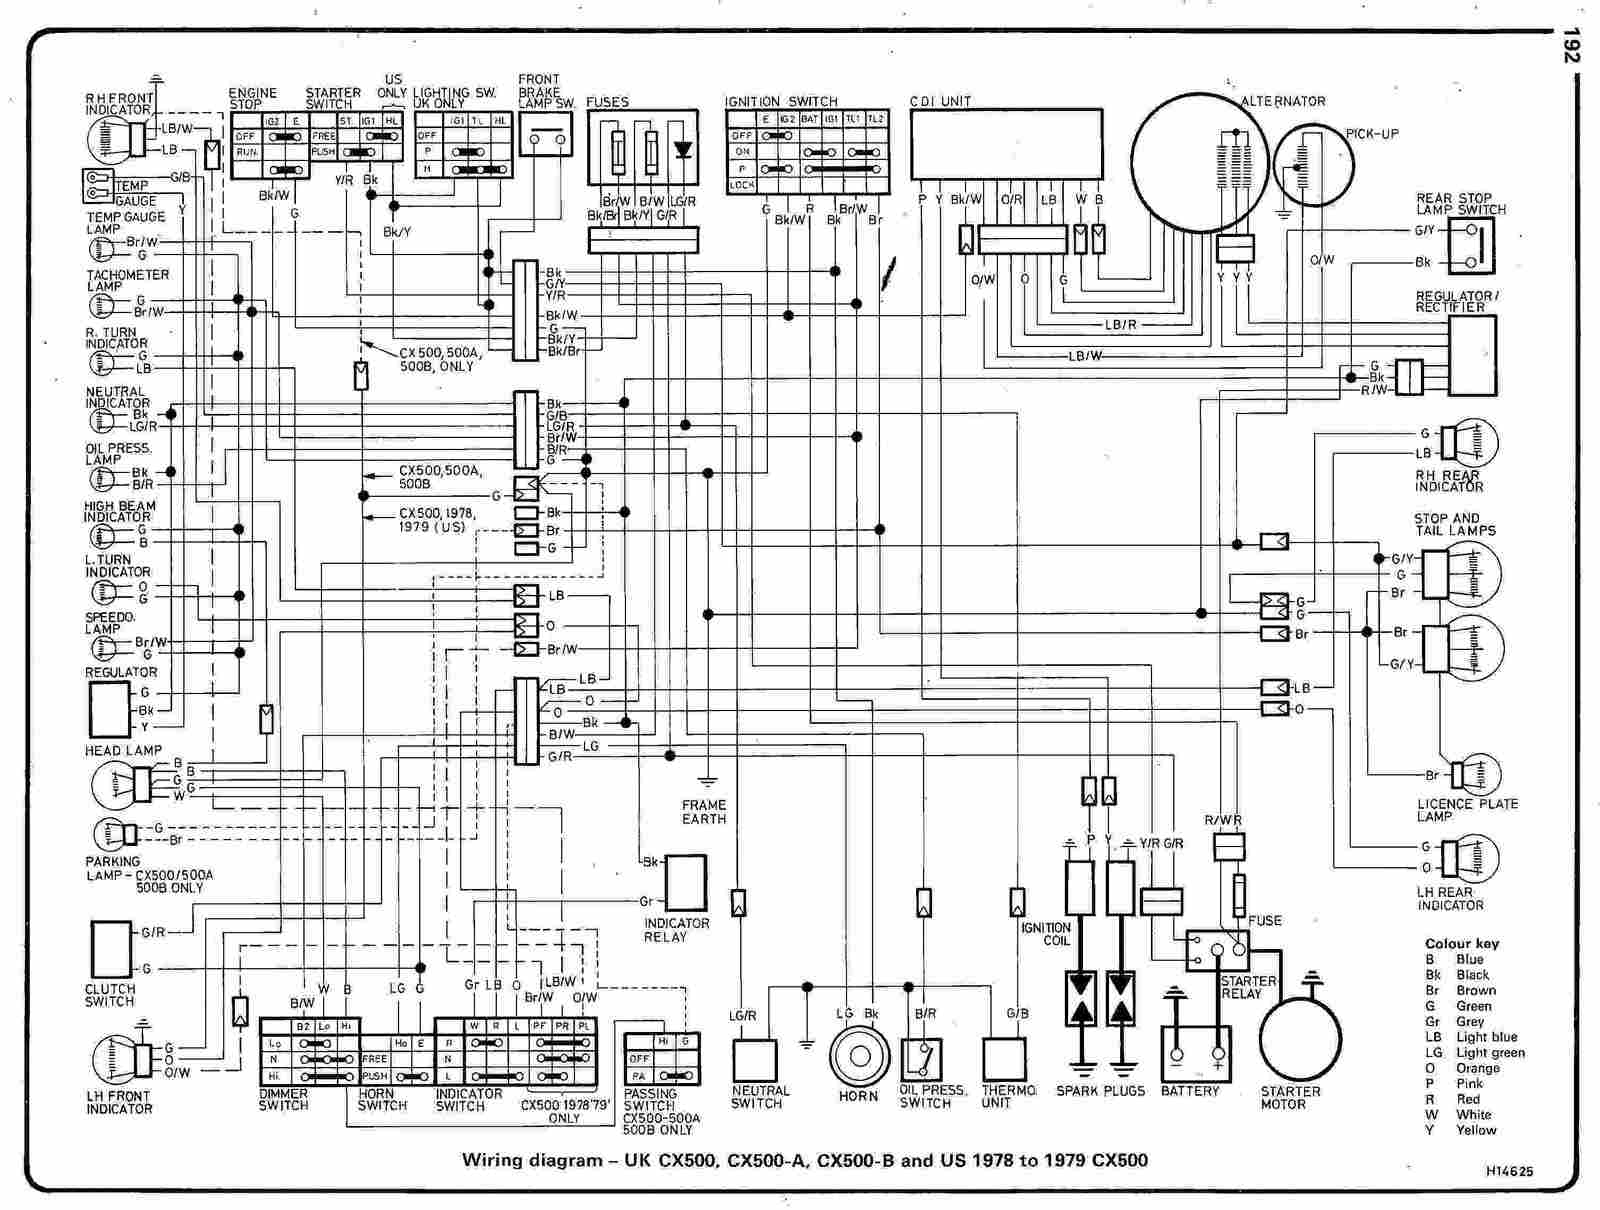 1988 Jeep Comanche Wiring Diagram Library For 1986 Cj Parts